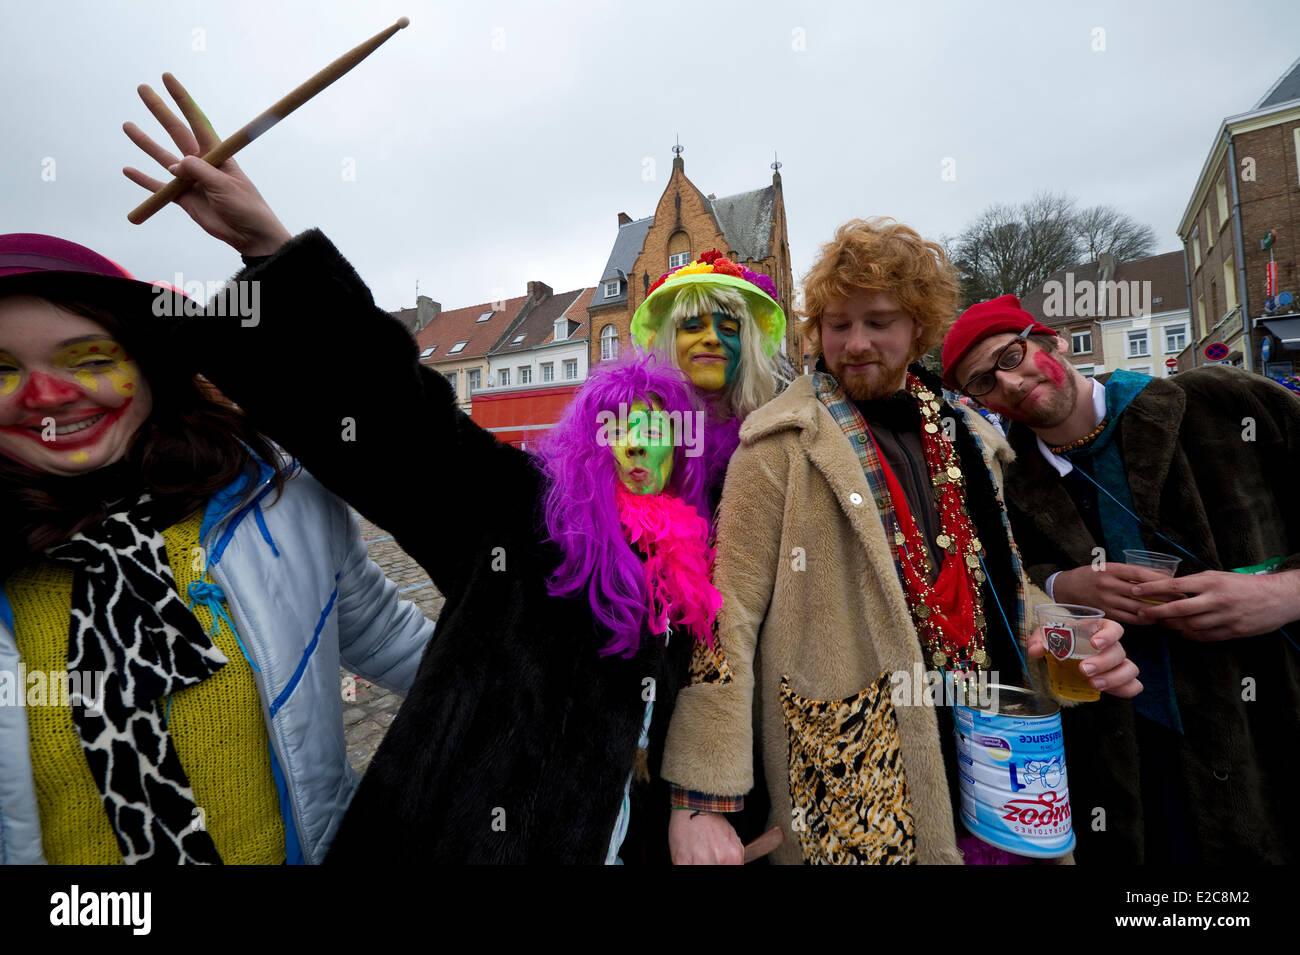 France, Nord, Cassel, Spring Carnival - Stock Image